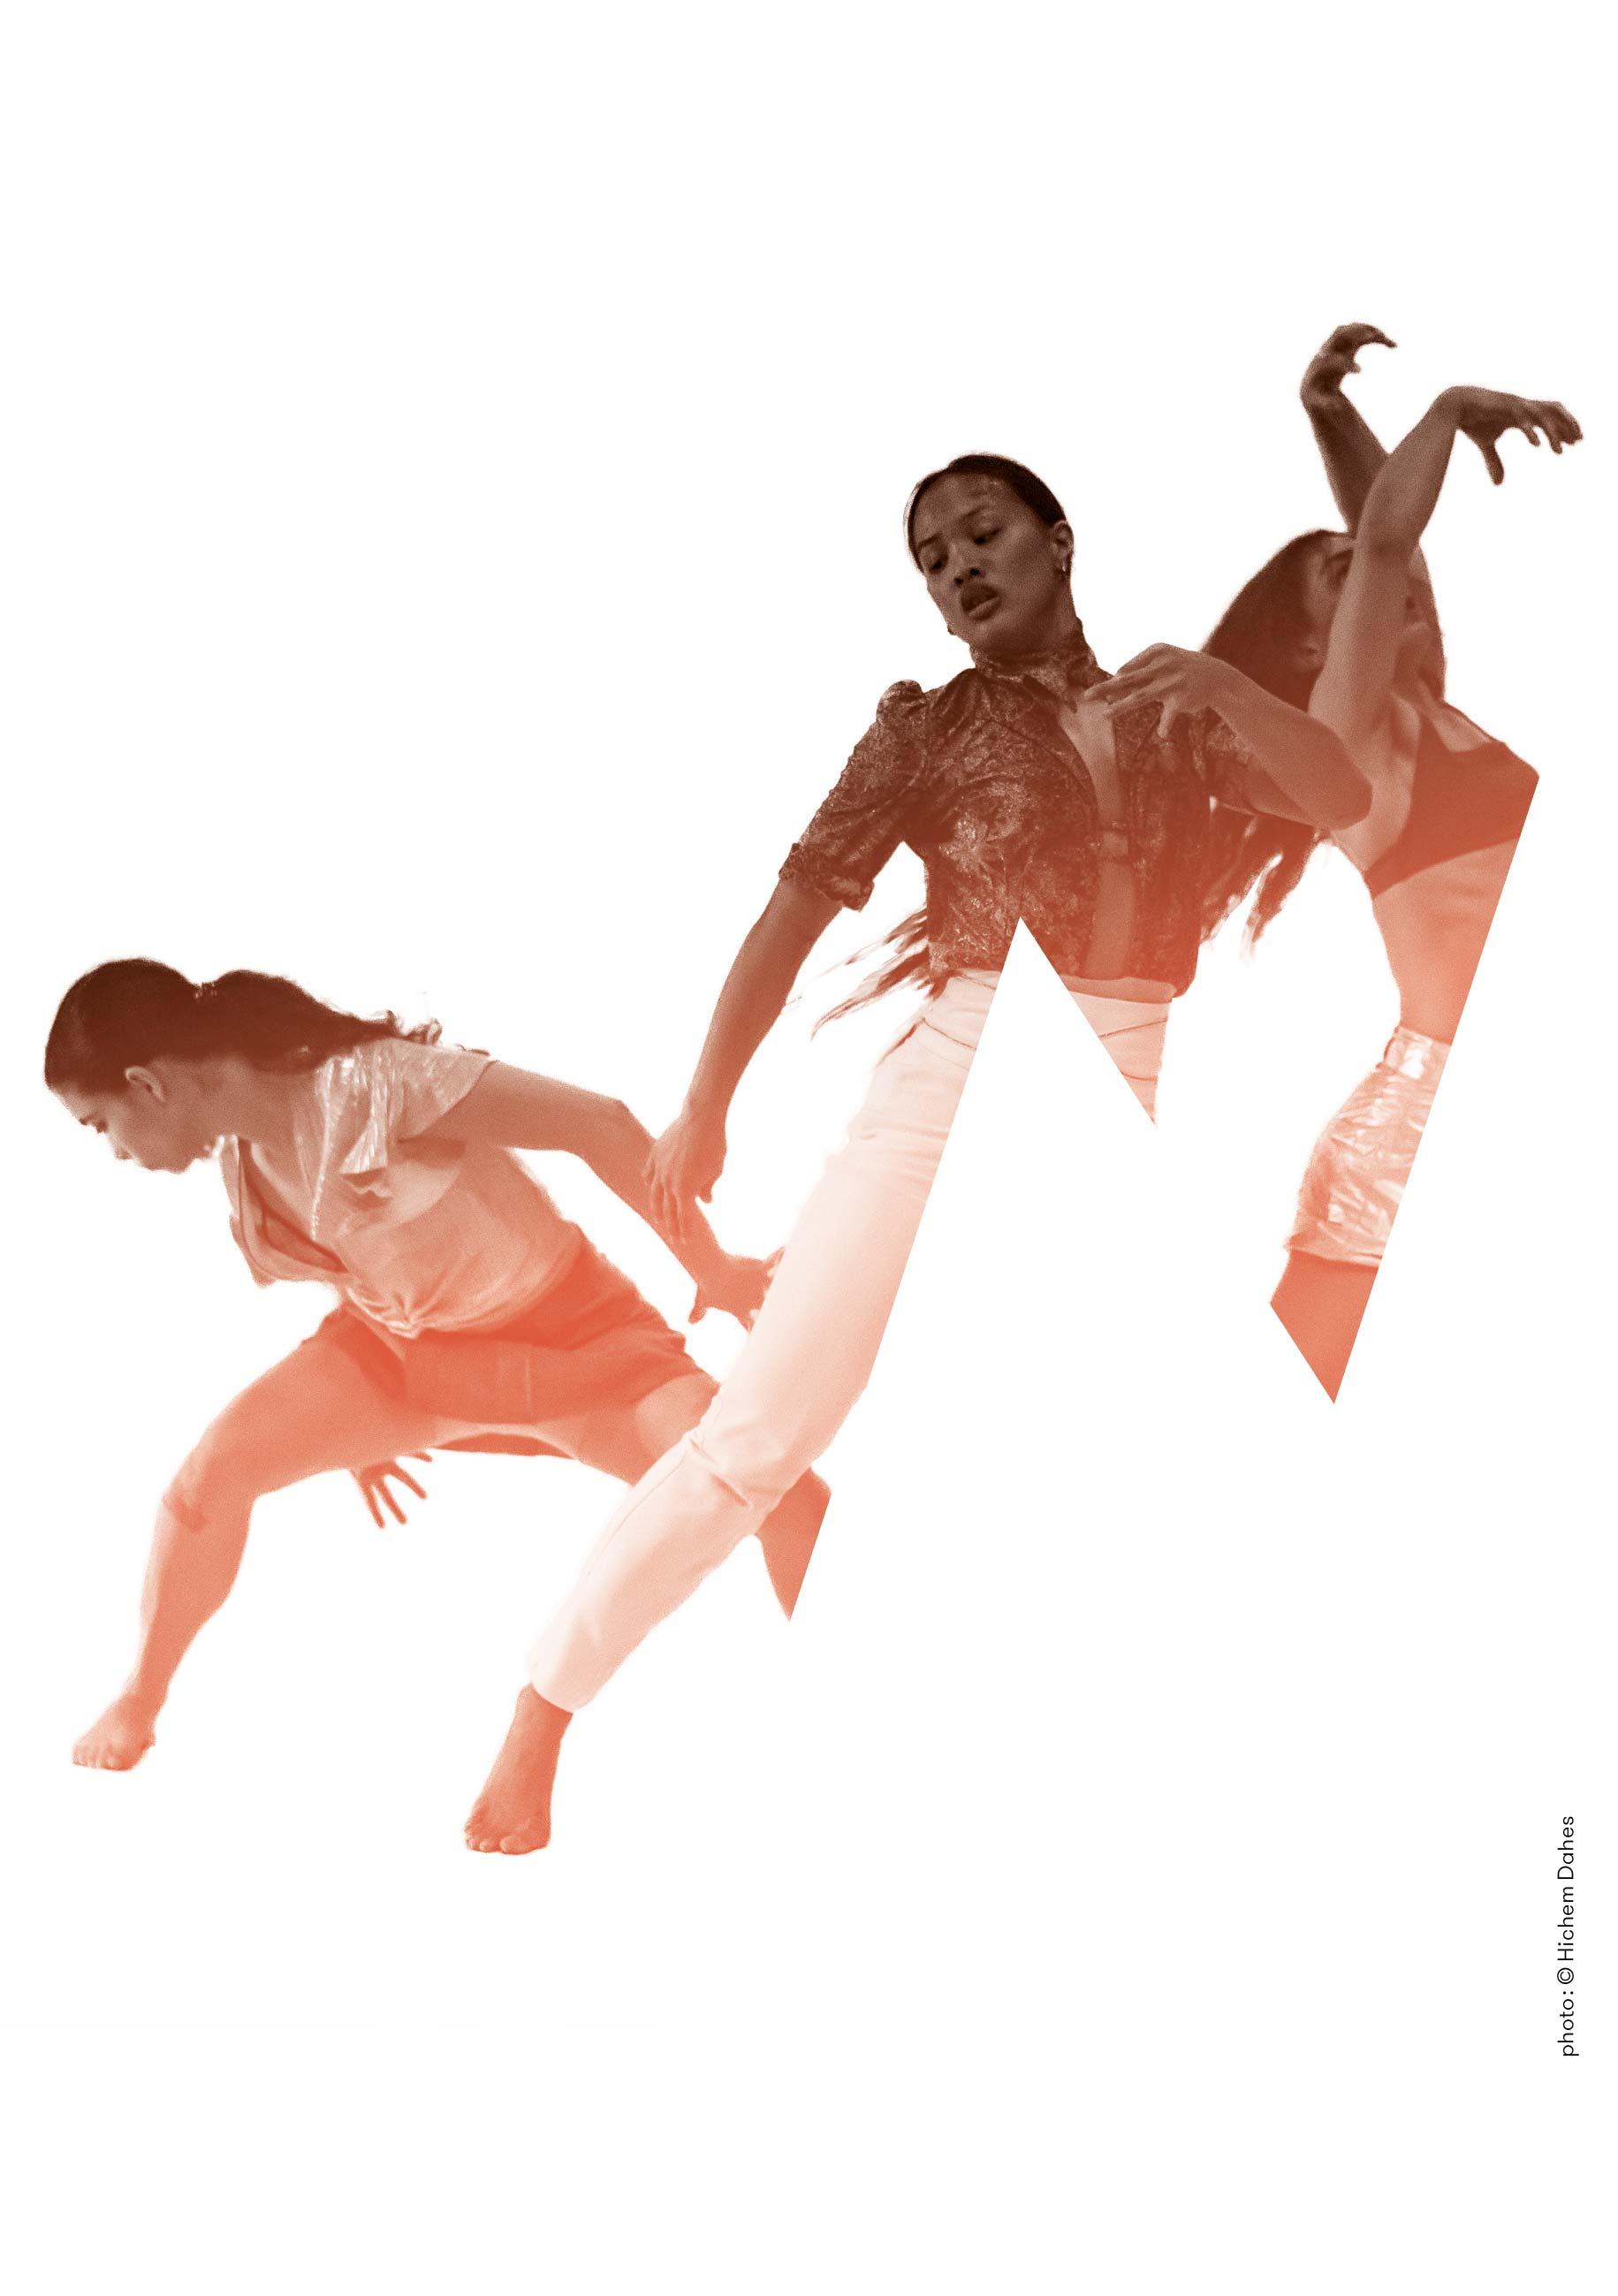 Anton-Lachky-Company-Steps-Migros-danse-tanz-nebia-biel-bienne